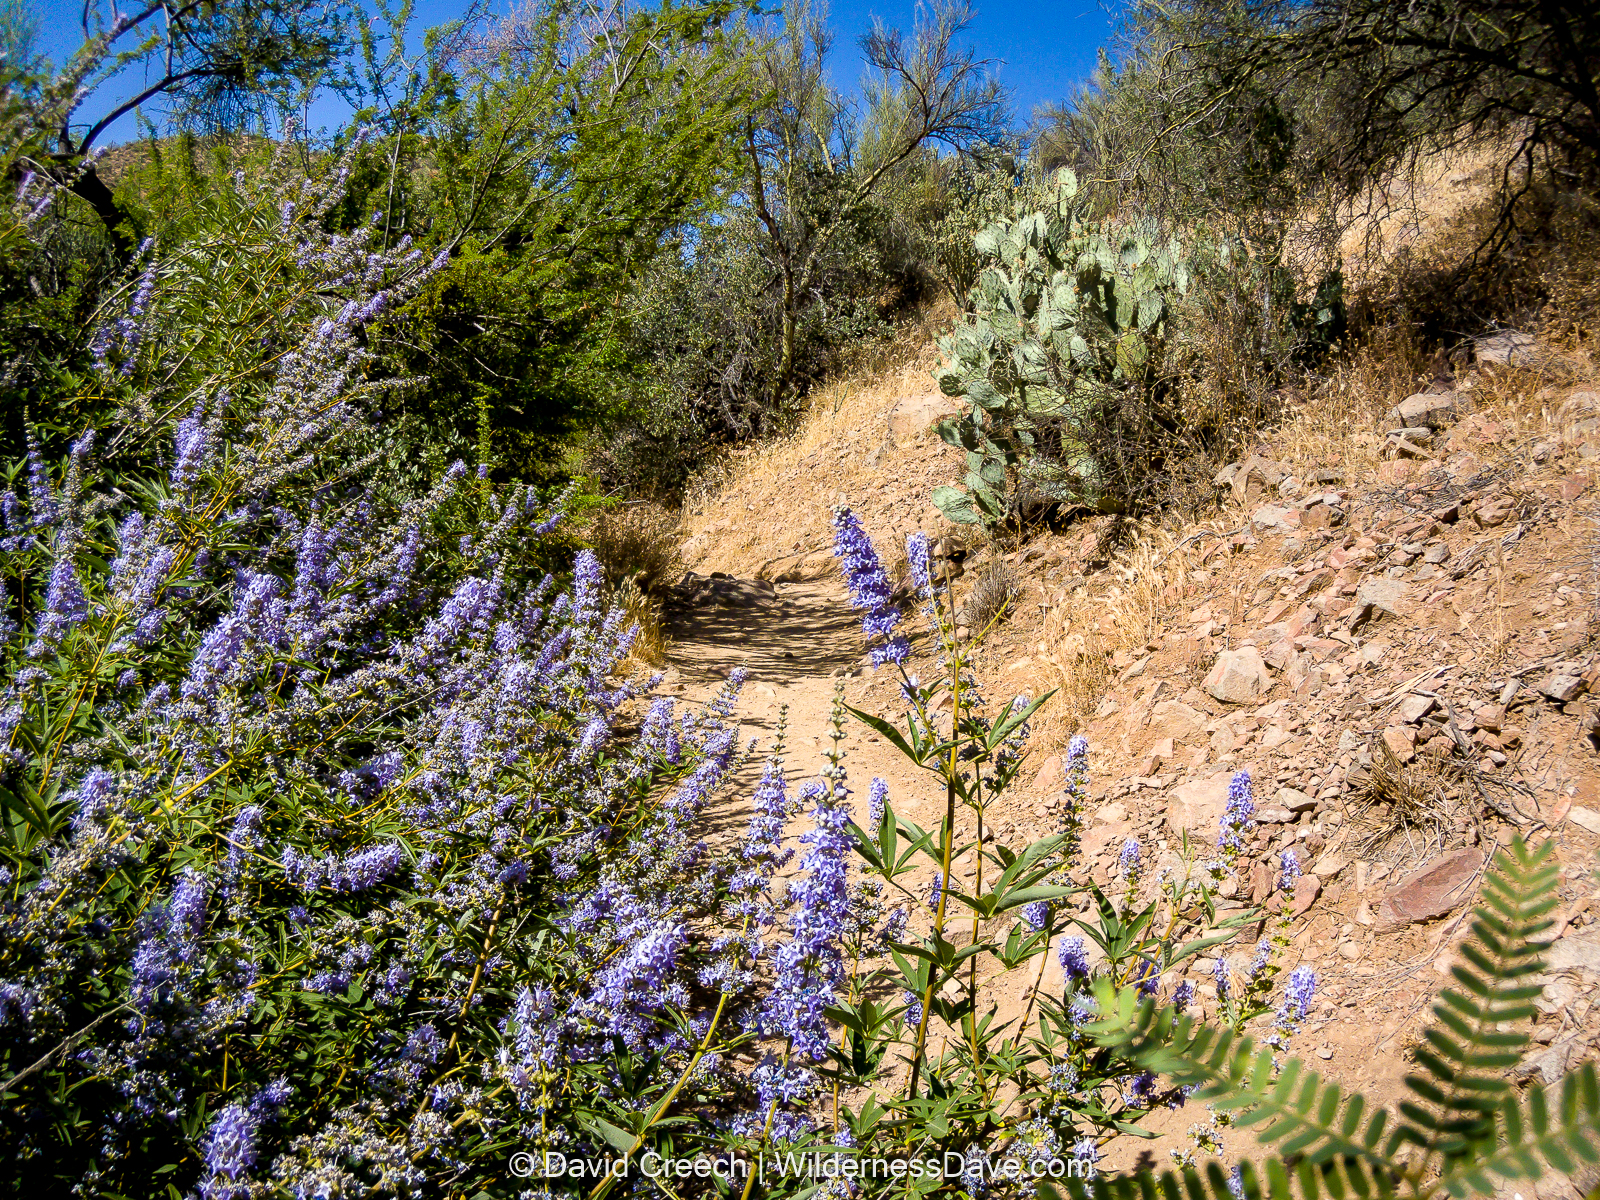 landscape revegetation